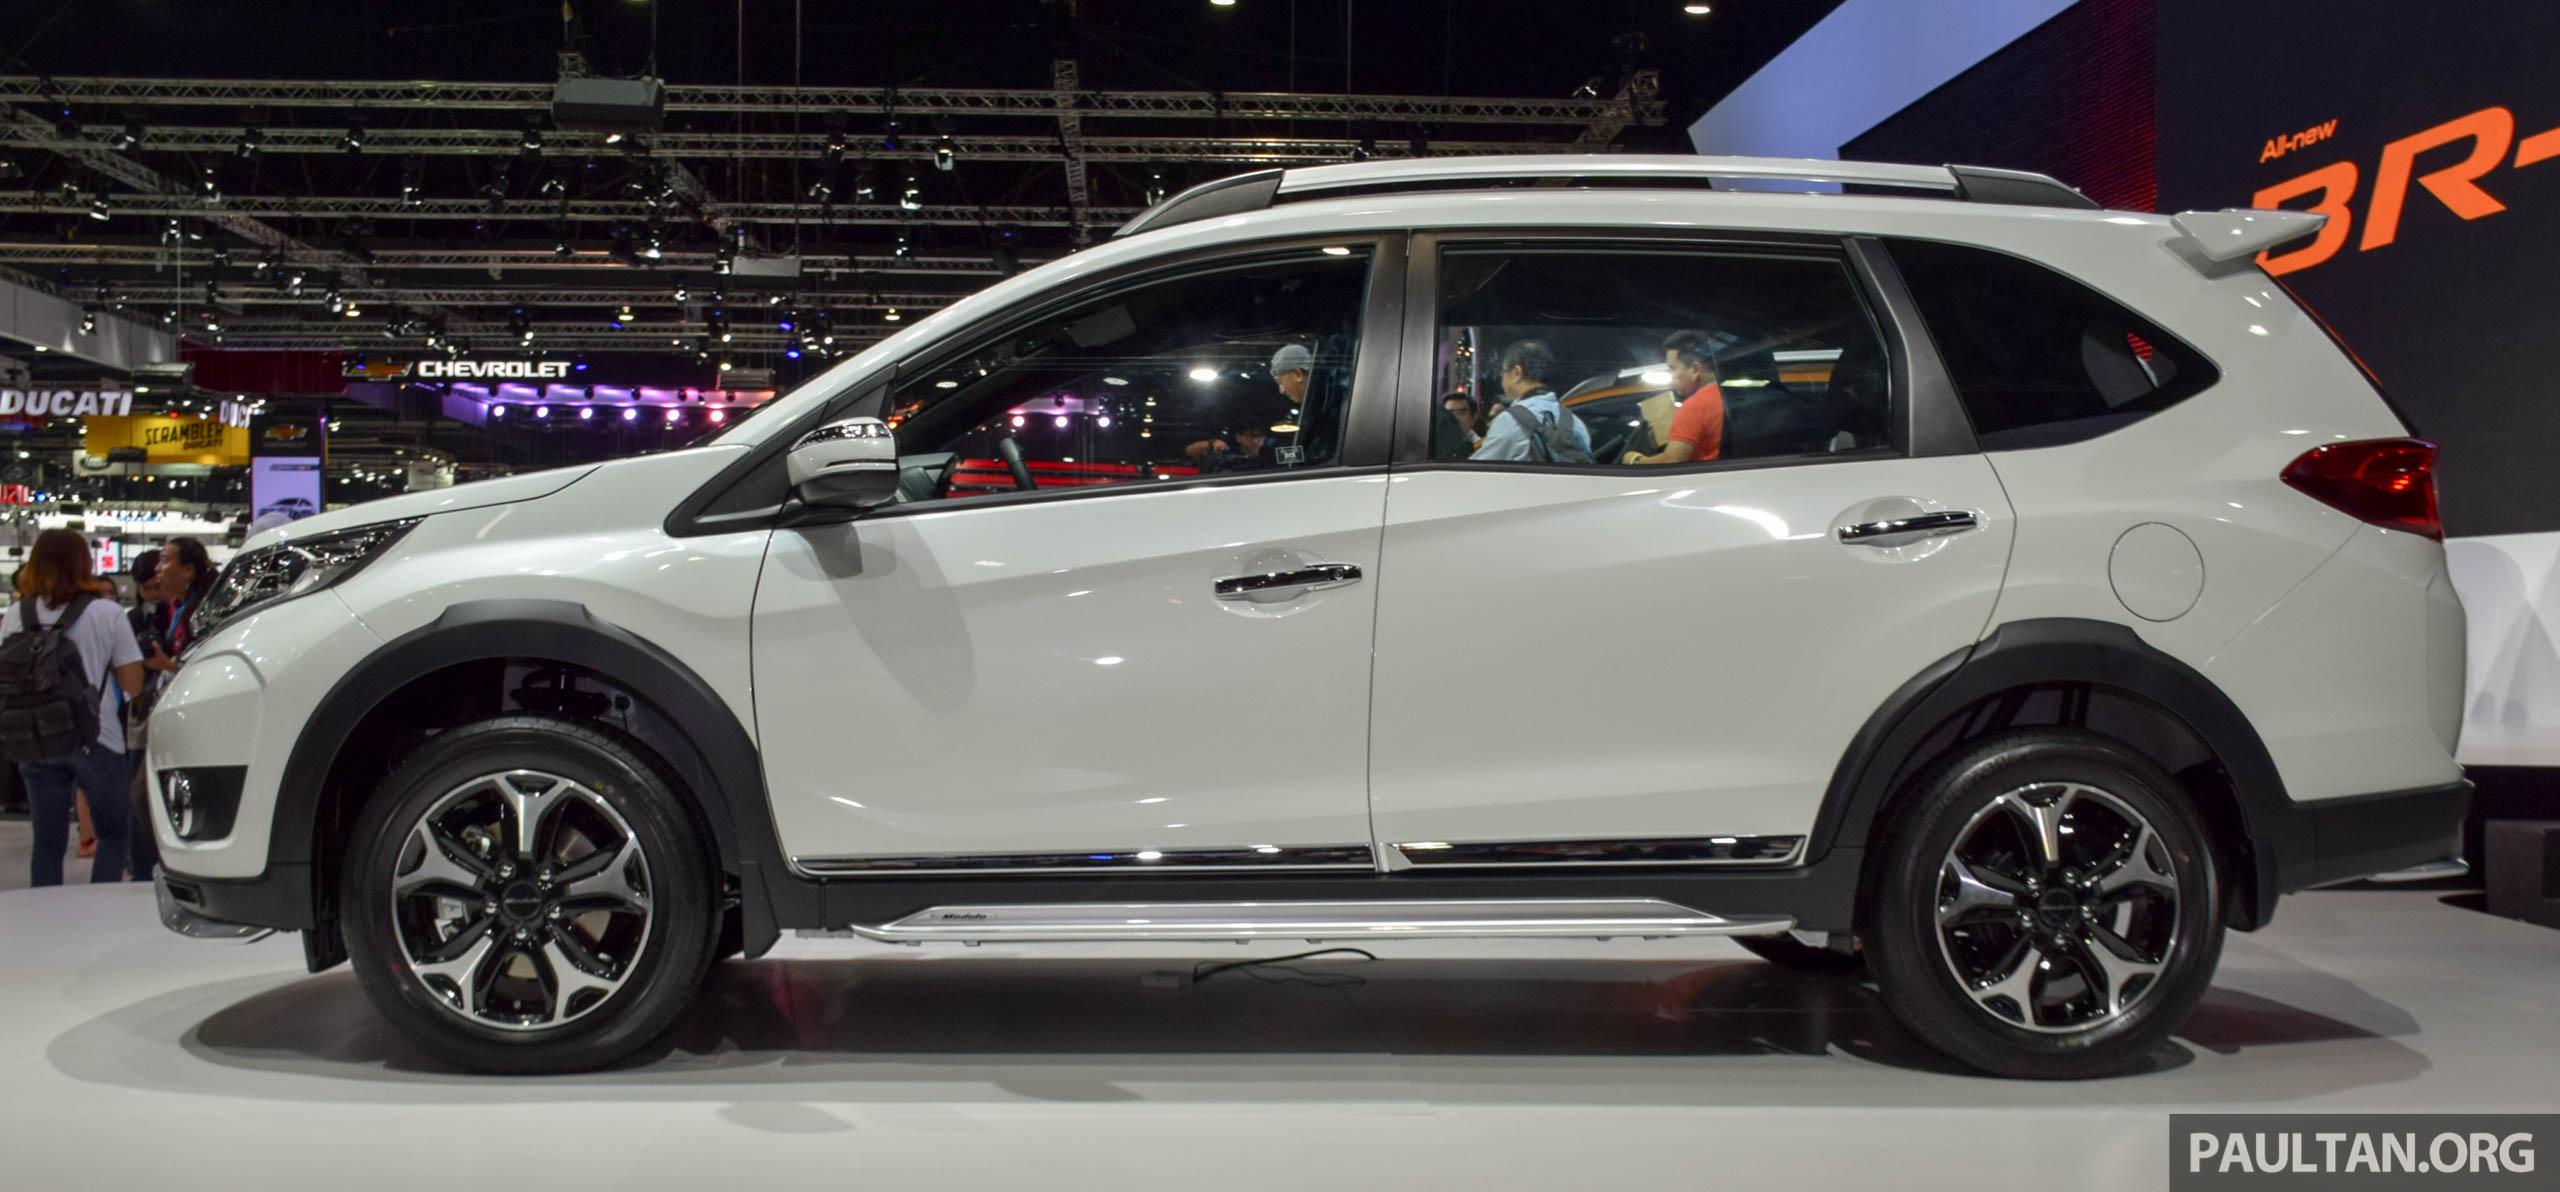 Honda BR-V 本地被拍到进行道路实测,预计明年上市。 honda_br-v_thailand_modulo ...